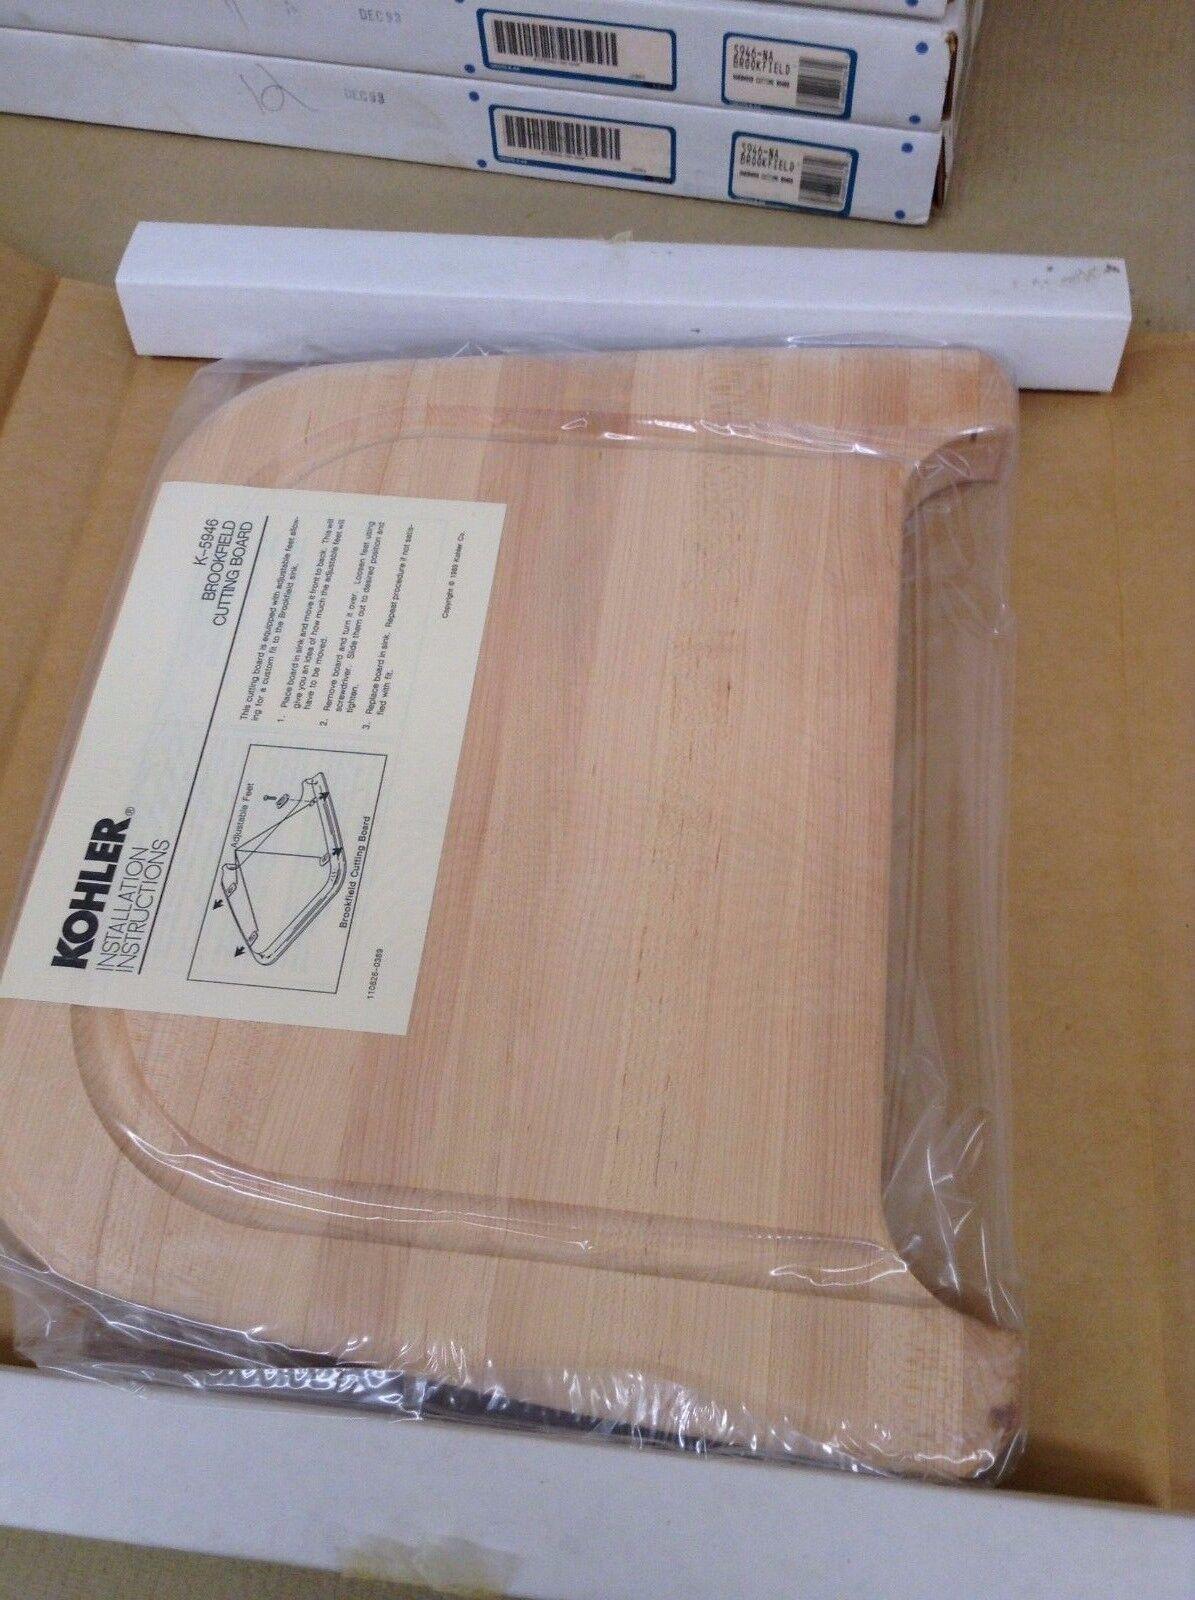 KOHLER BROOKFIELD hardwood cutting board K-5946 - K-5946-NA